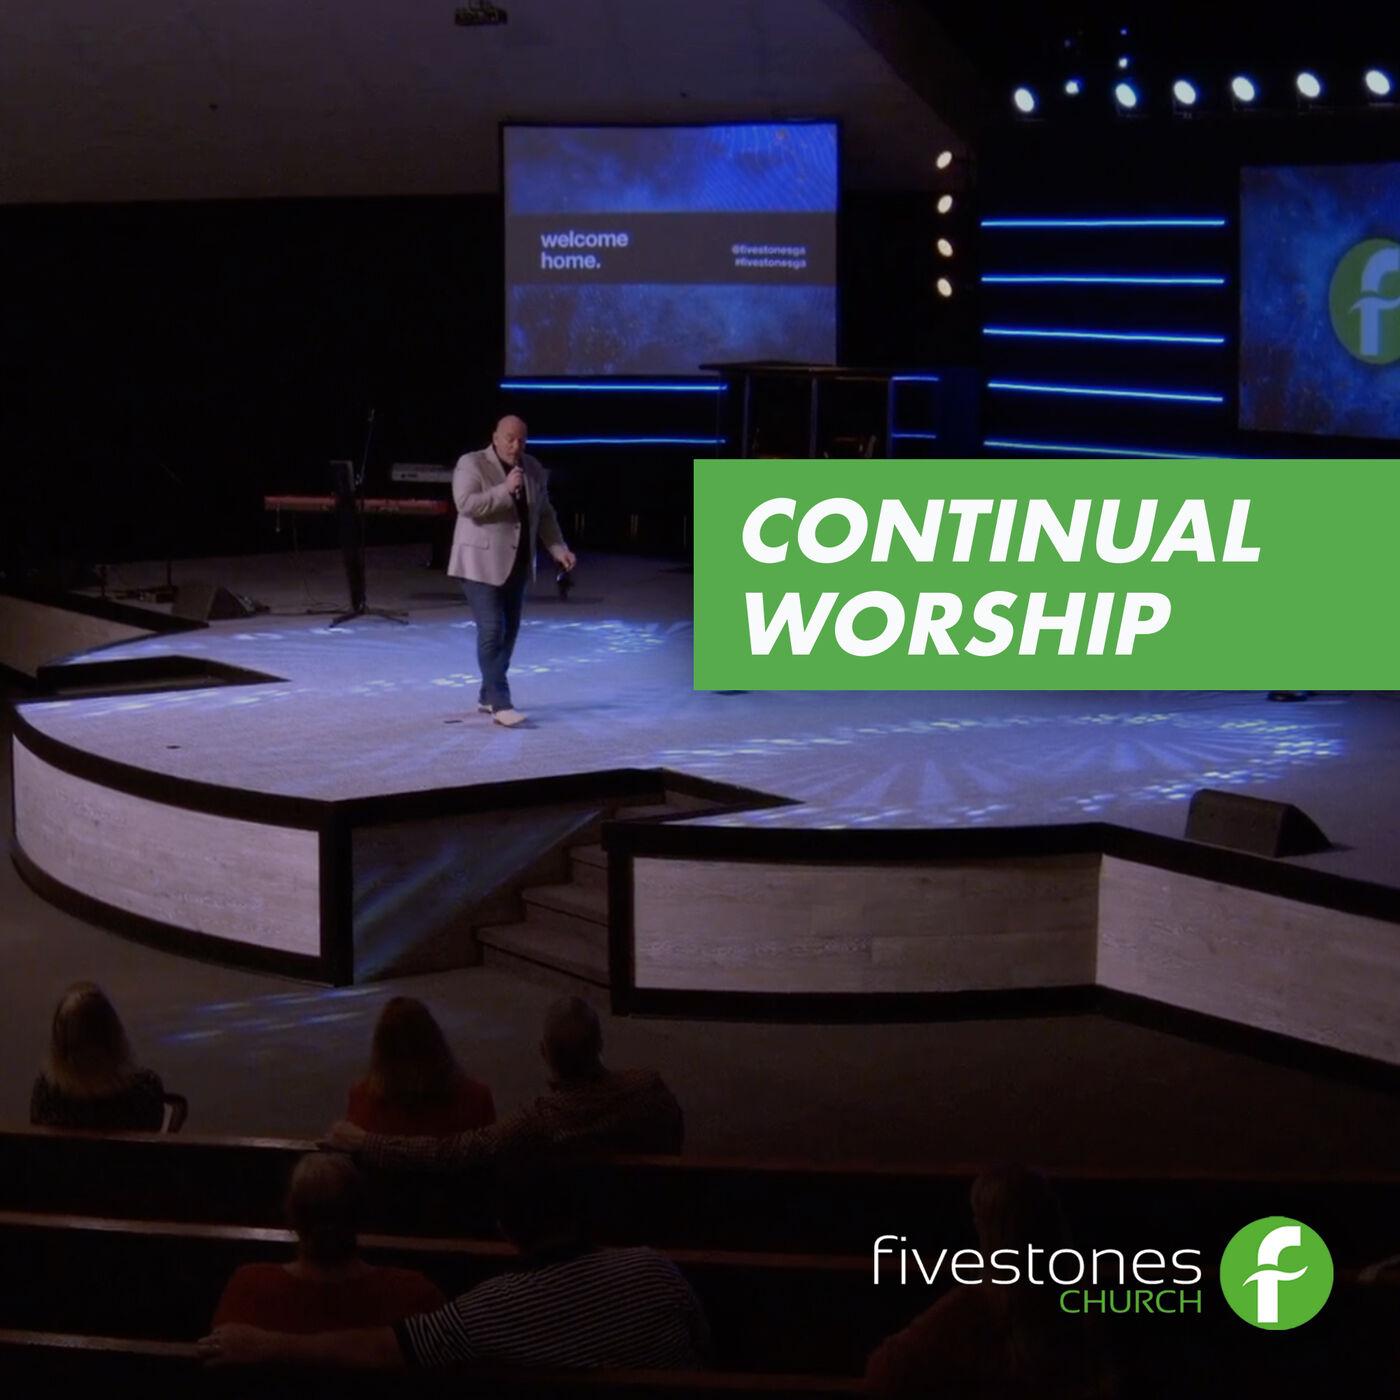 Continual Worship